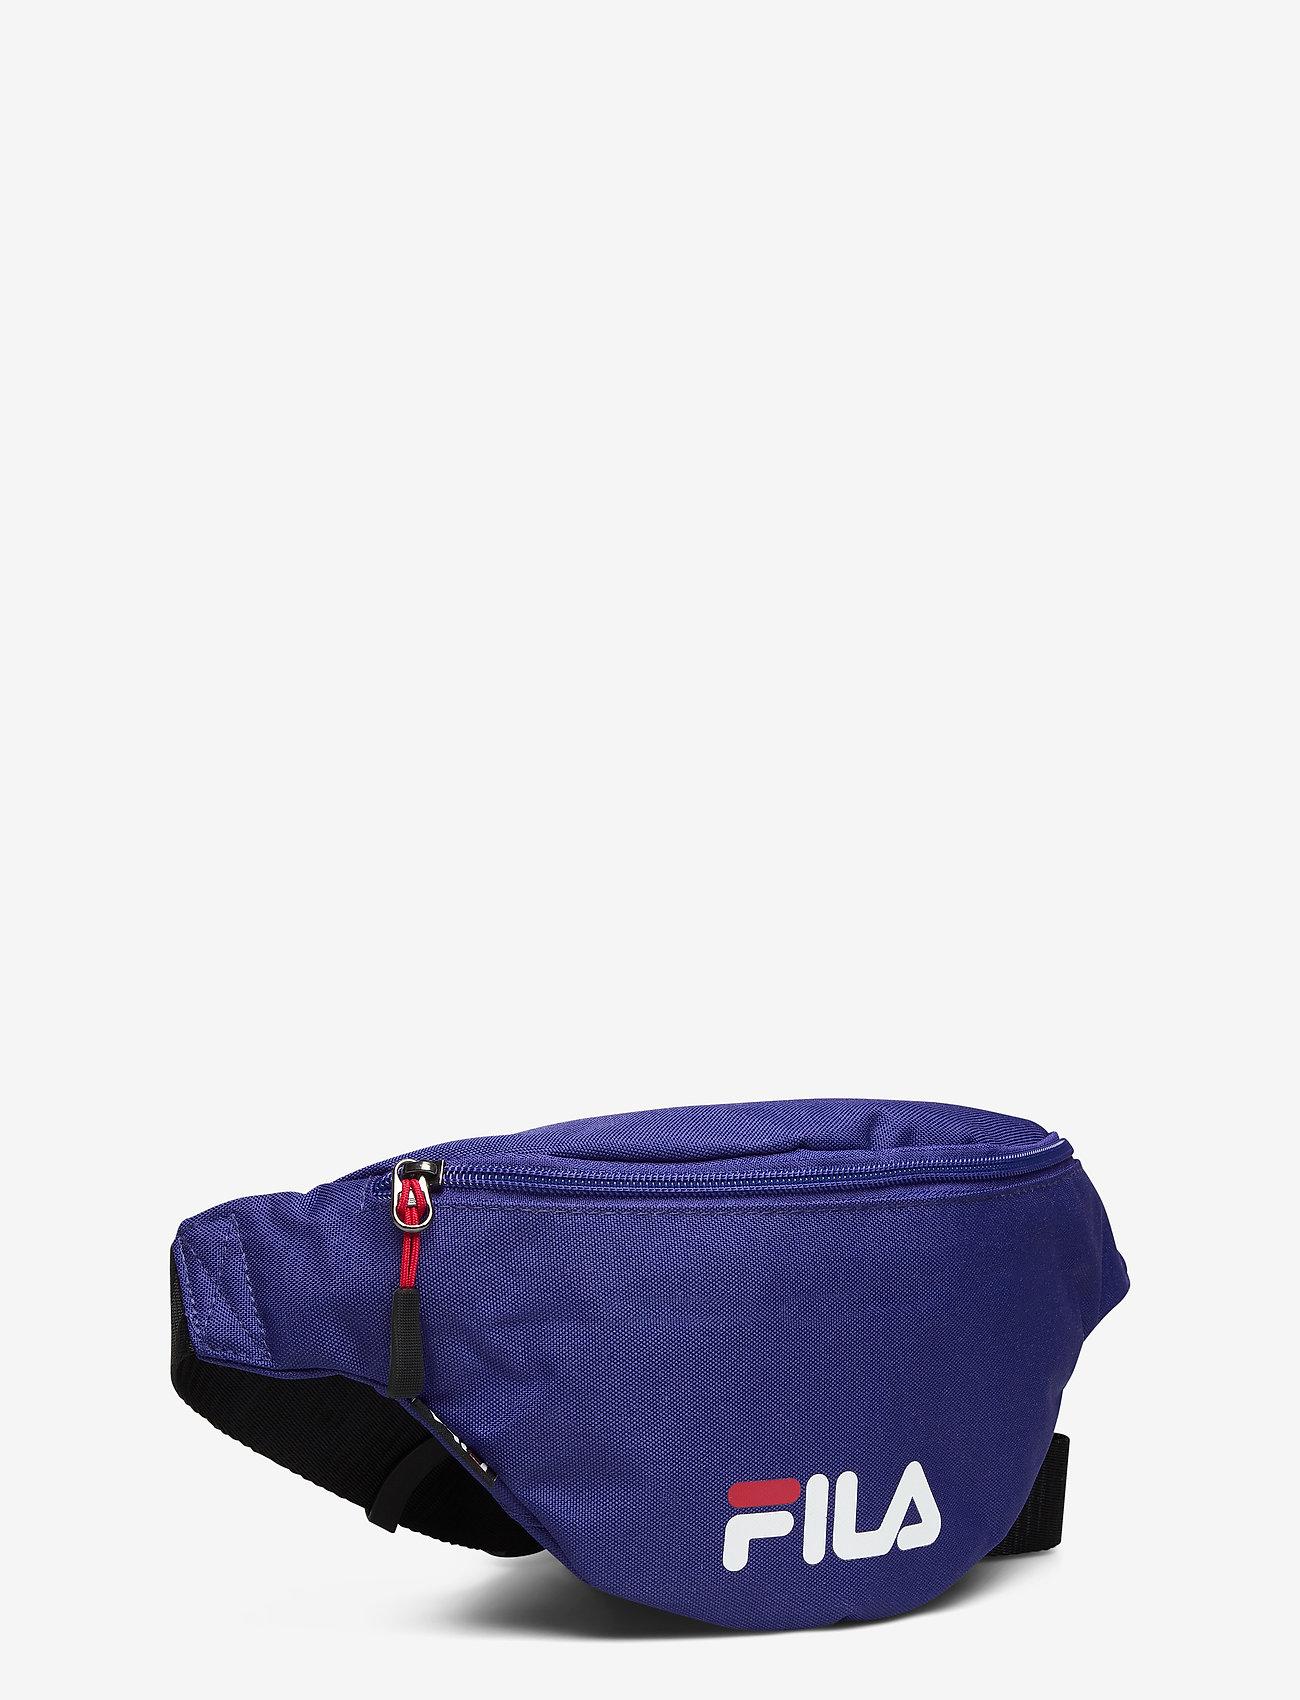 FILA - WAIST BAG SLIM (small logo) - sacs banane - clematis blue - 1